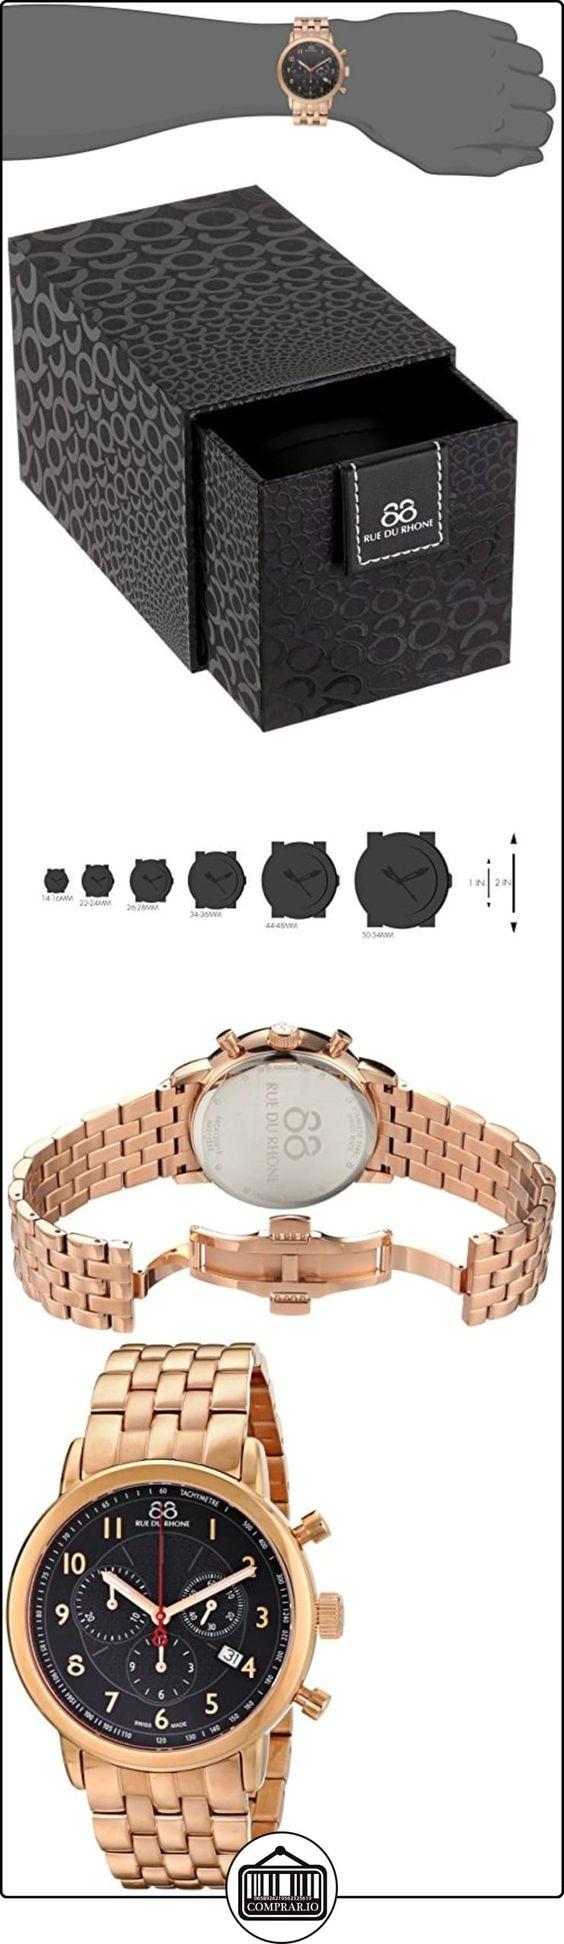 88 Rue Du Rhone Double 8 Origin Mens Rose Gold PVD Chronograph Watch 87WA120049  ✿ Relojes para hombre - (Lujo) ✿